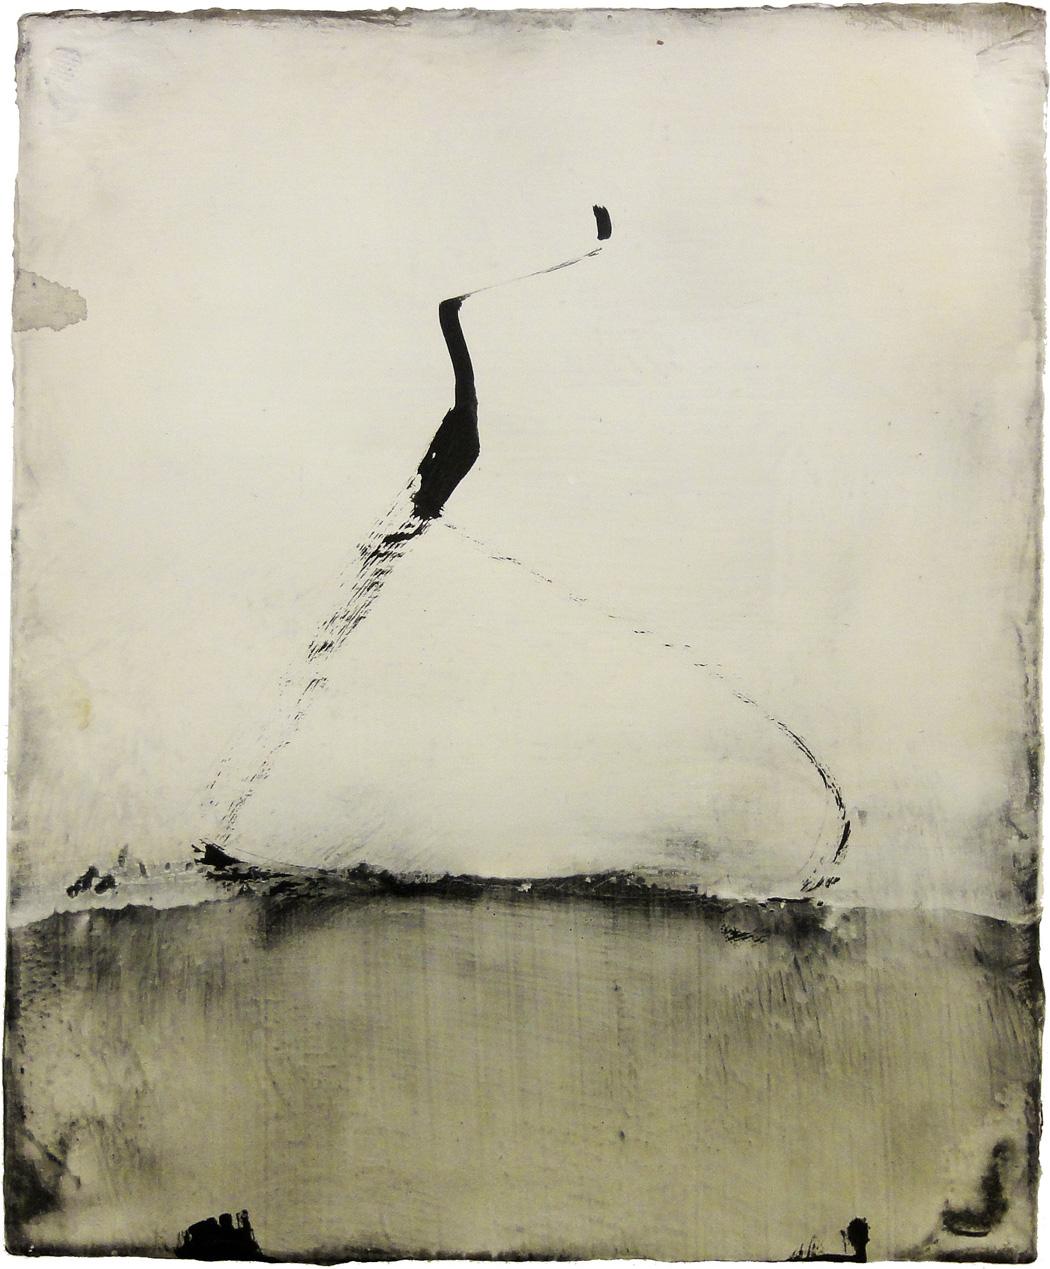 Hideaki Yamanobe_Klangassoziationen Form No. 125, 2015, Acryl-Mischtechnik auf LW, 28 x 23 cm